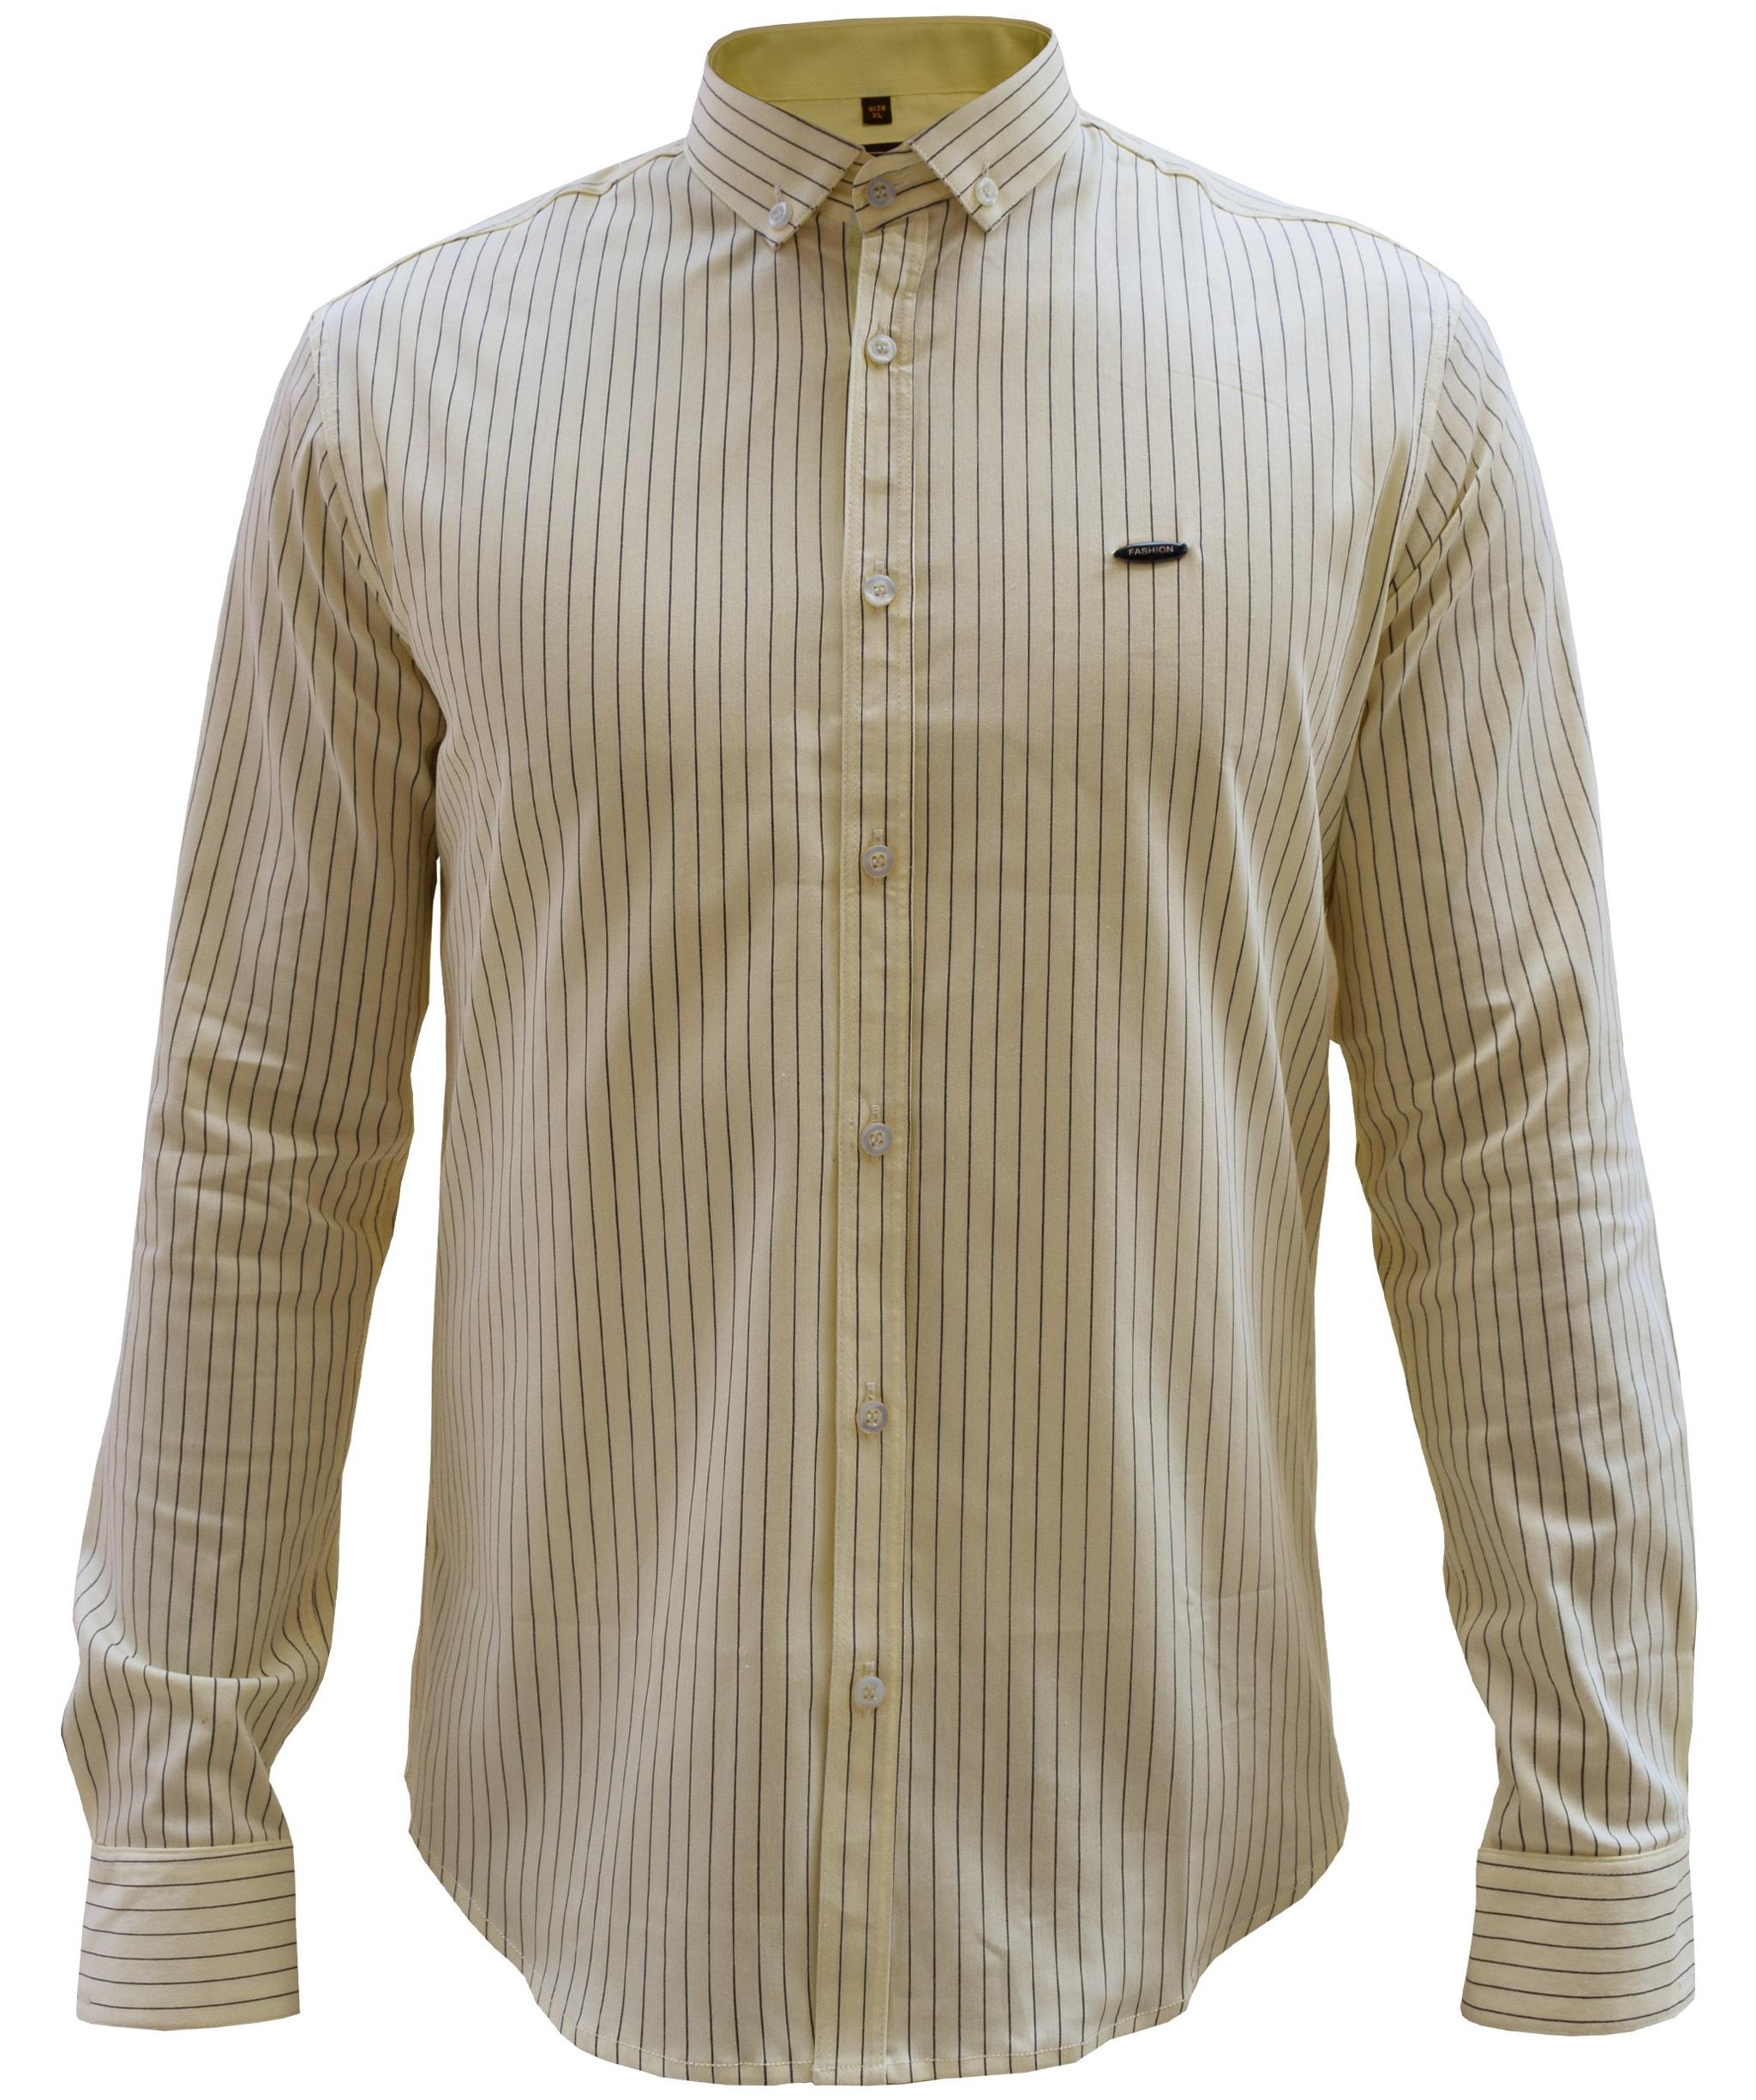 پیراهن مردانه کد 2045226